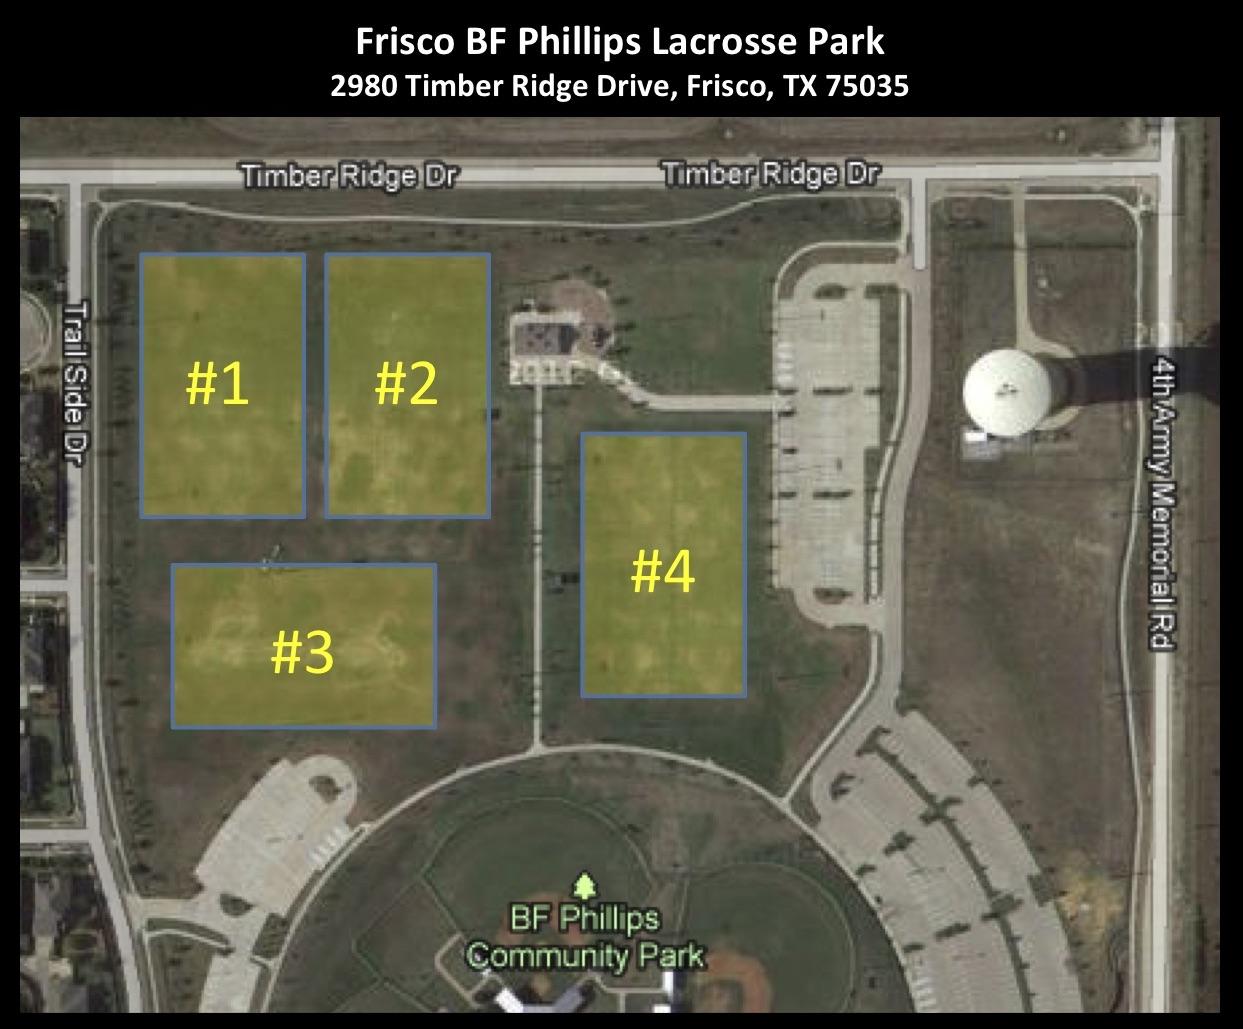 BF_Phillips_Lacrosse_Park_Map_Image.jpg